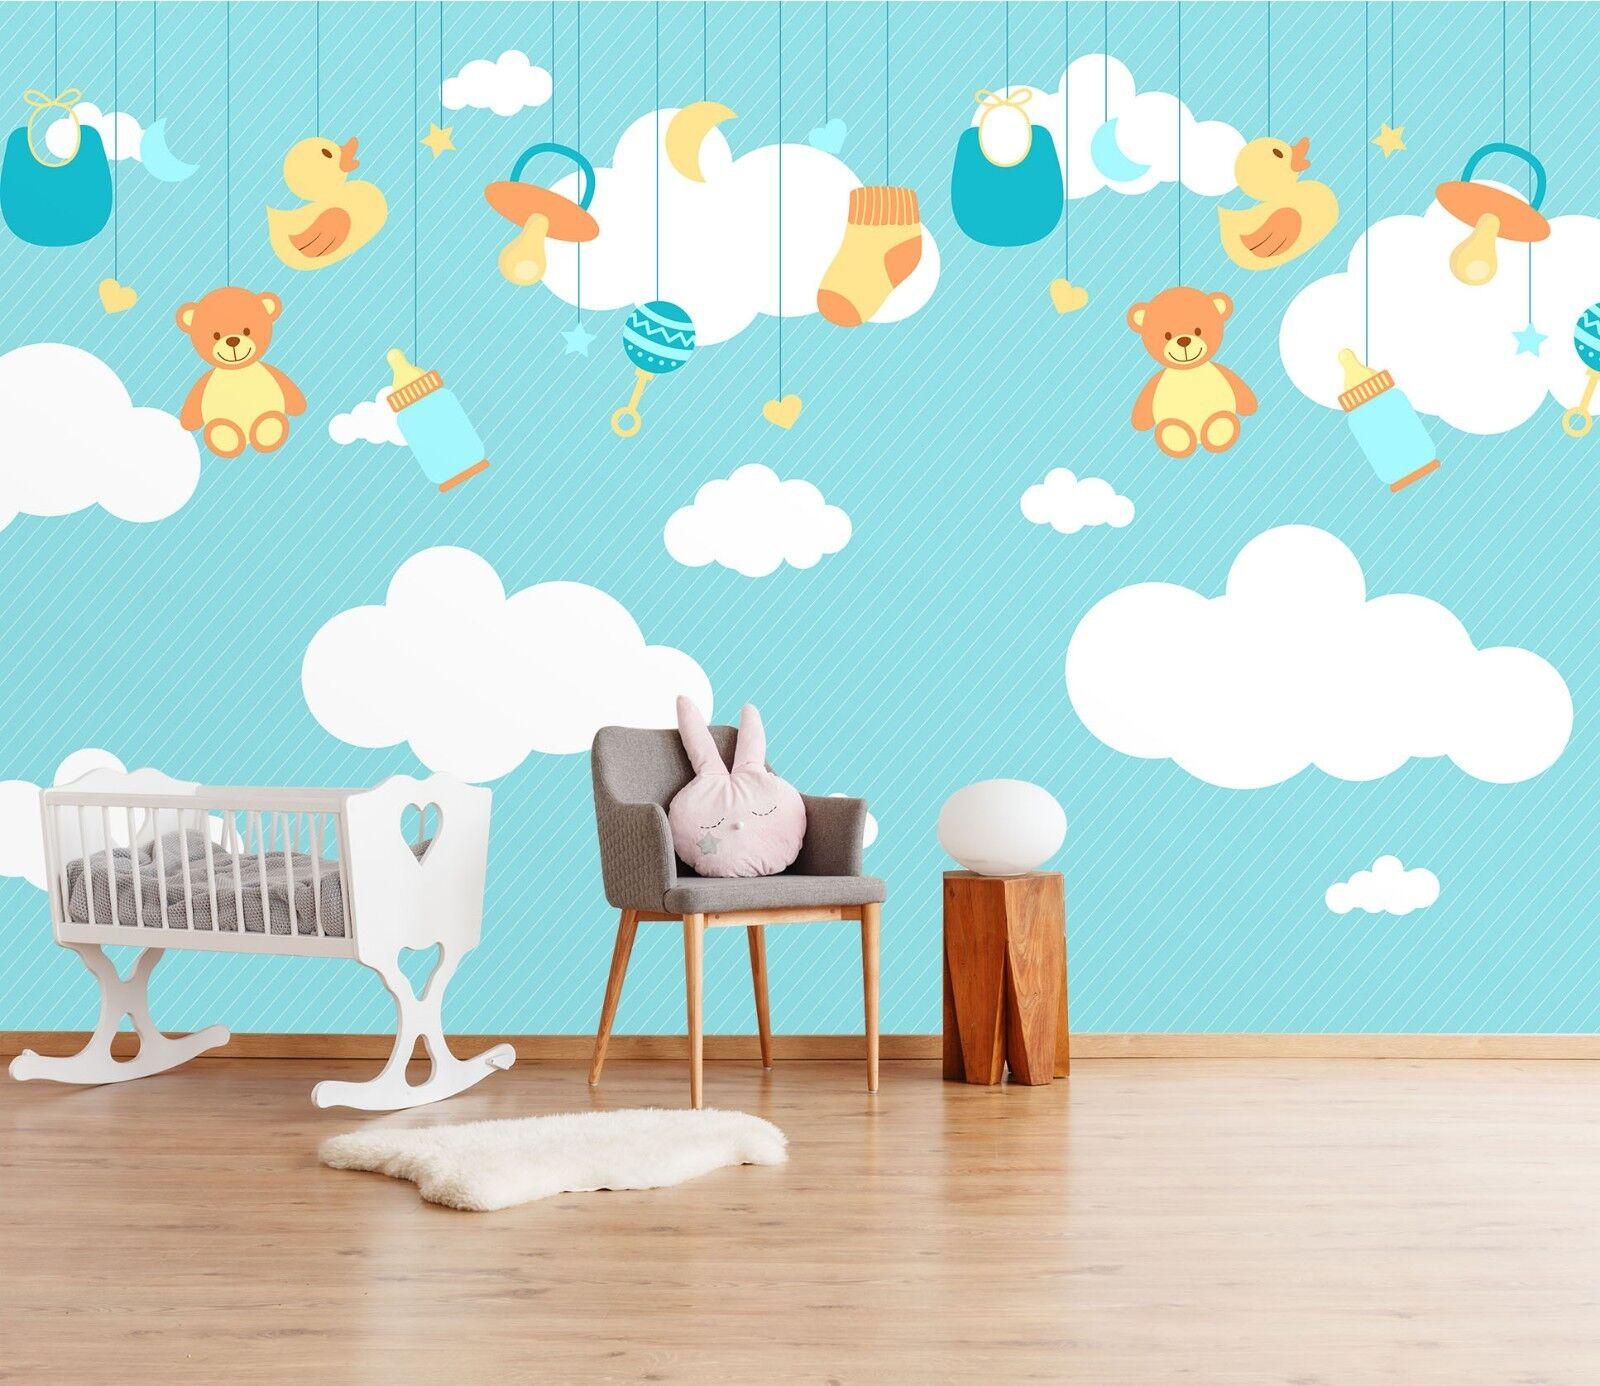 3D Clouds Unicorn  7050 Wallpaper Mural Paper Wall Print Indoor Murals CA Summer